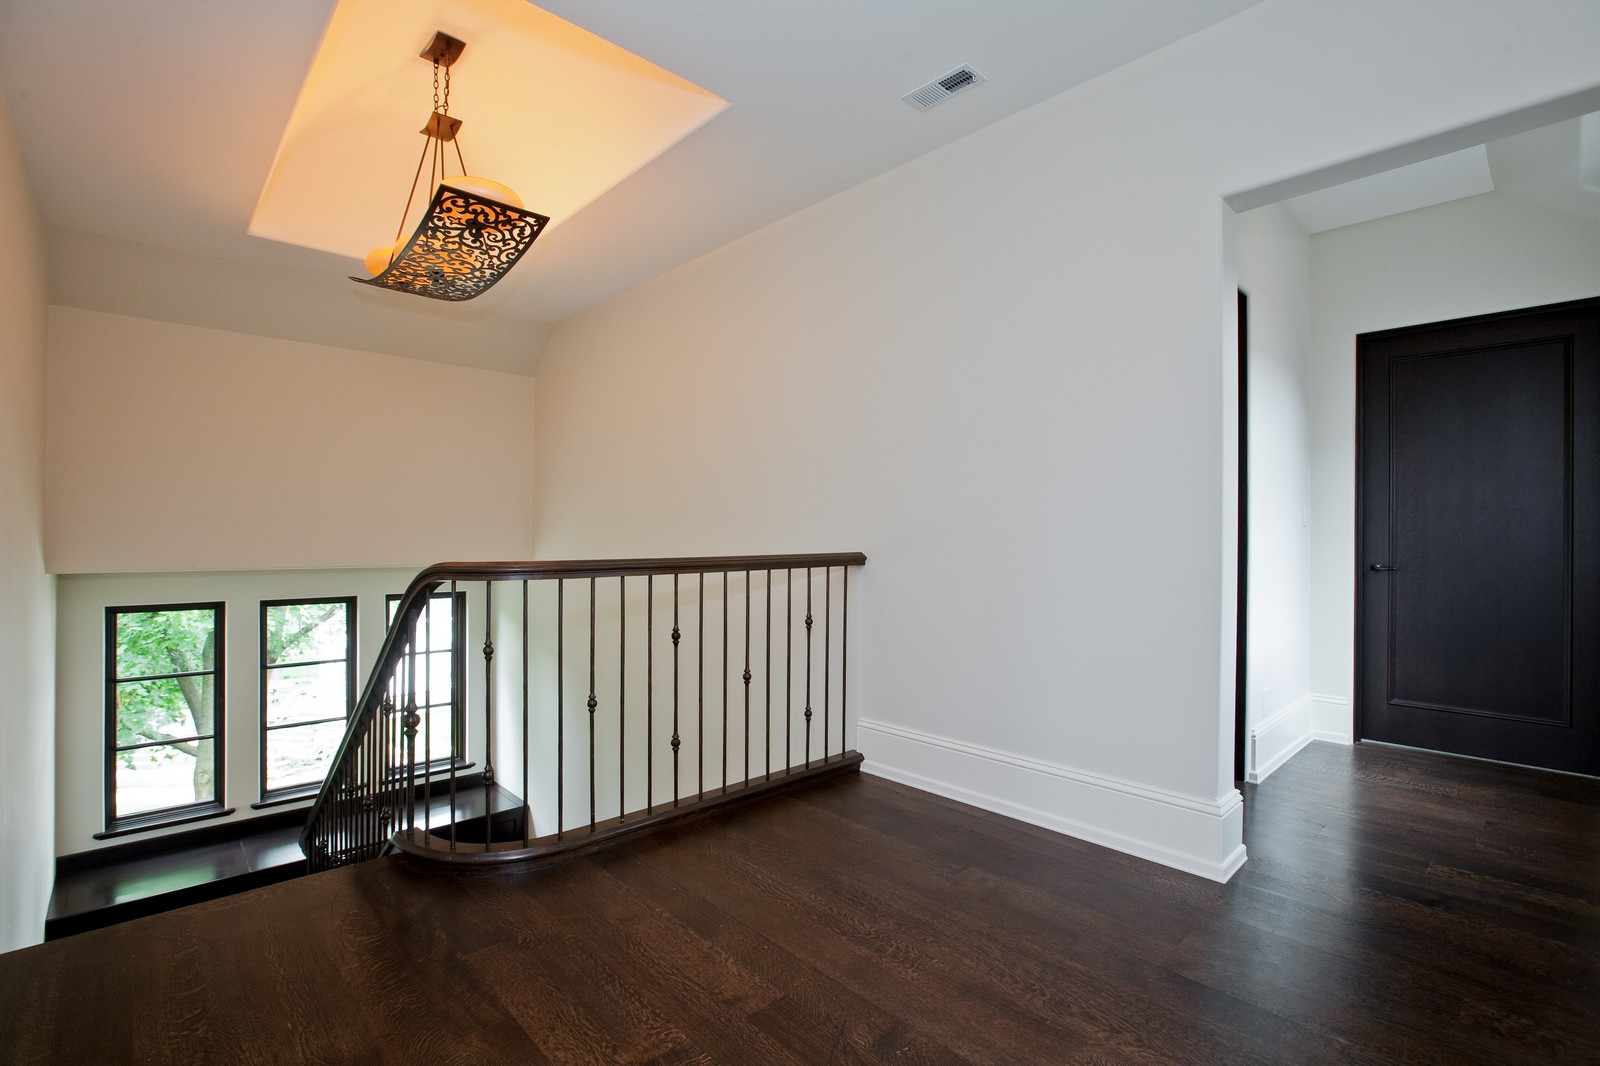 Real Estate Photography - 6143 Madison, Burr Ridge, IL, 60527 - 2nd Level